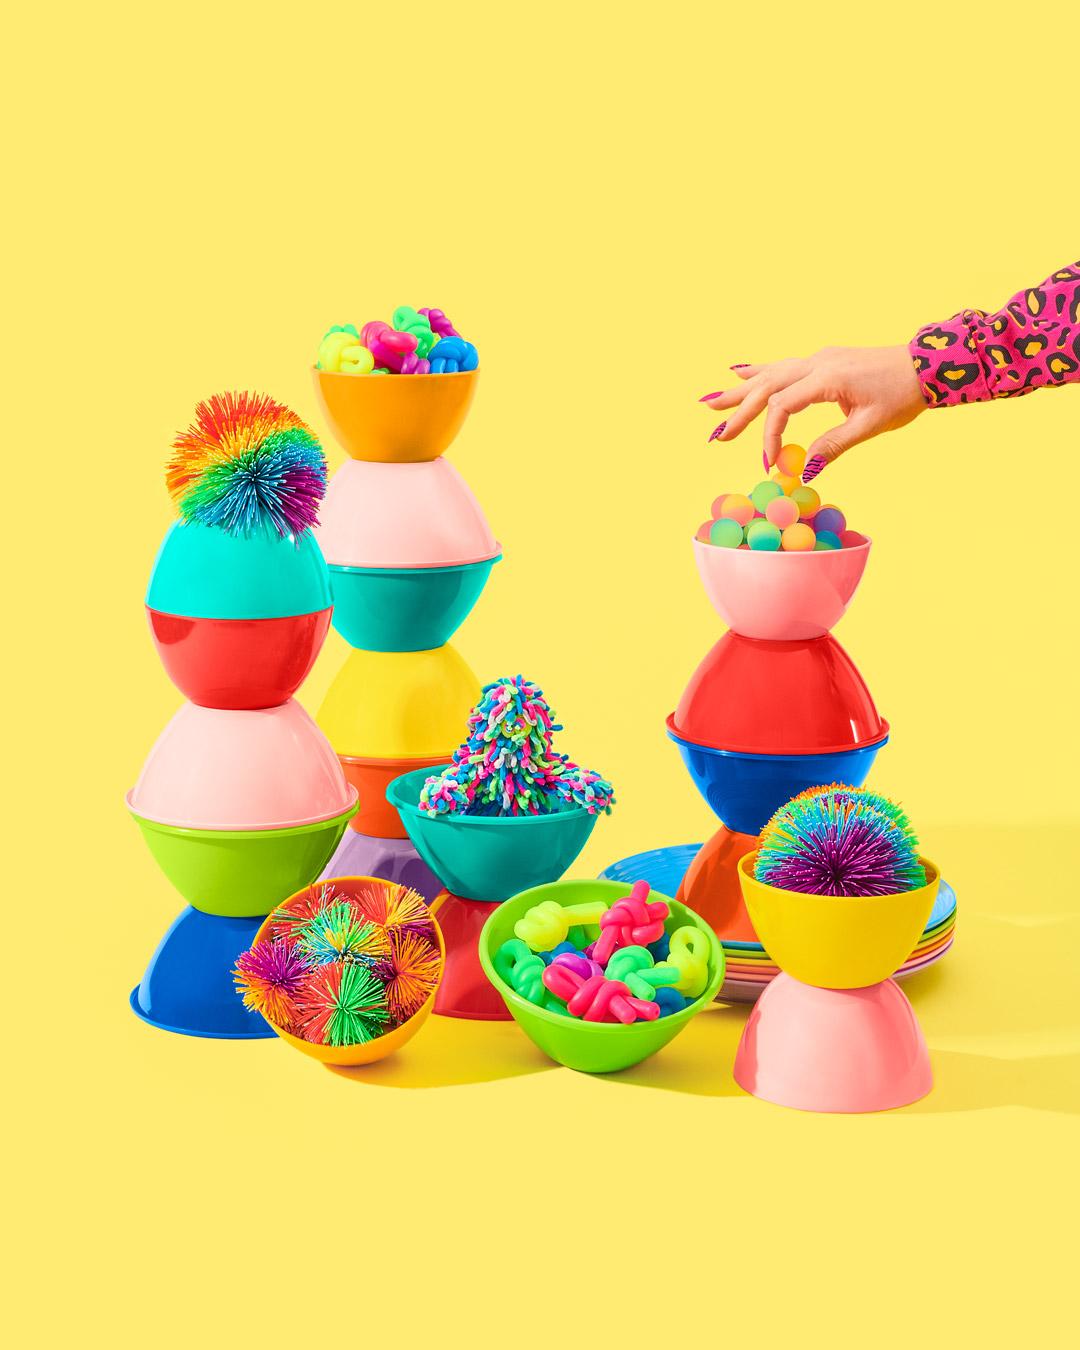 credits: photo - jenna gang, styling - chelsea volpe, nails - natsume chiharu, model - pauline sherrow  description: model grabbing for colorful ball.